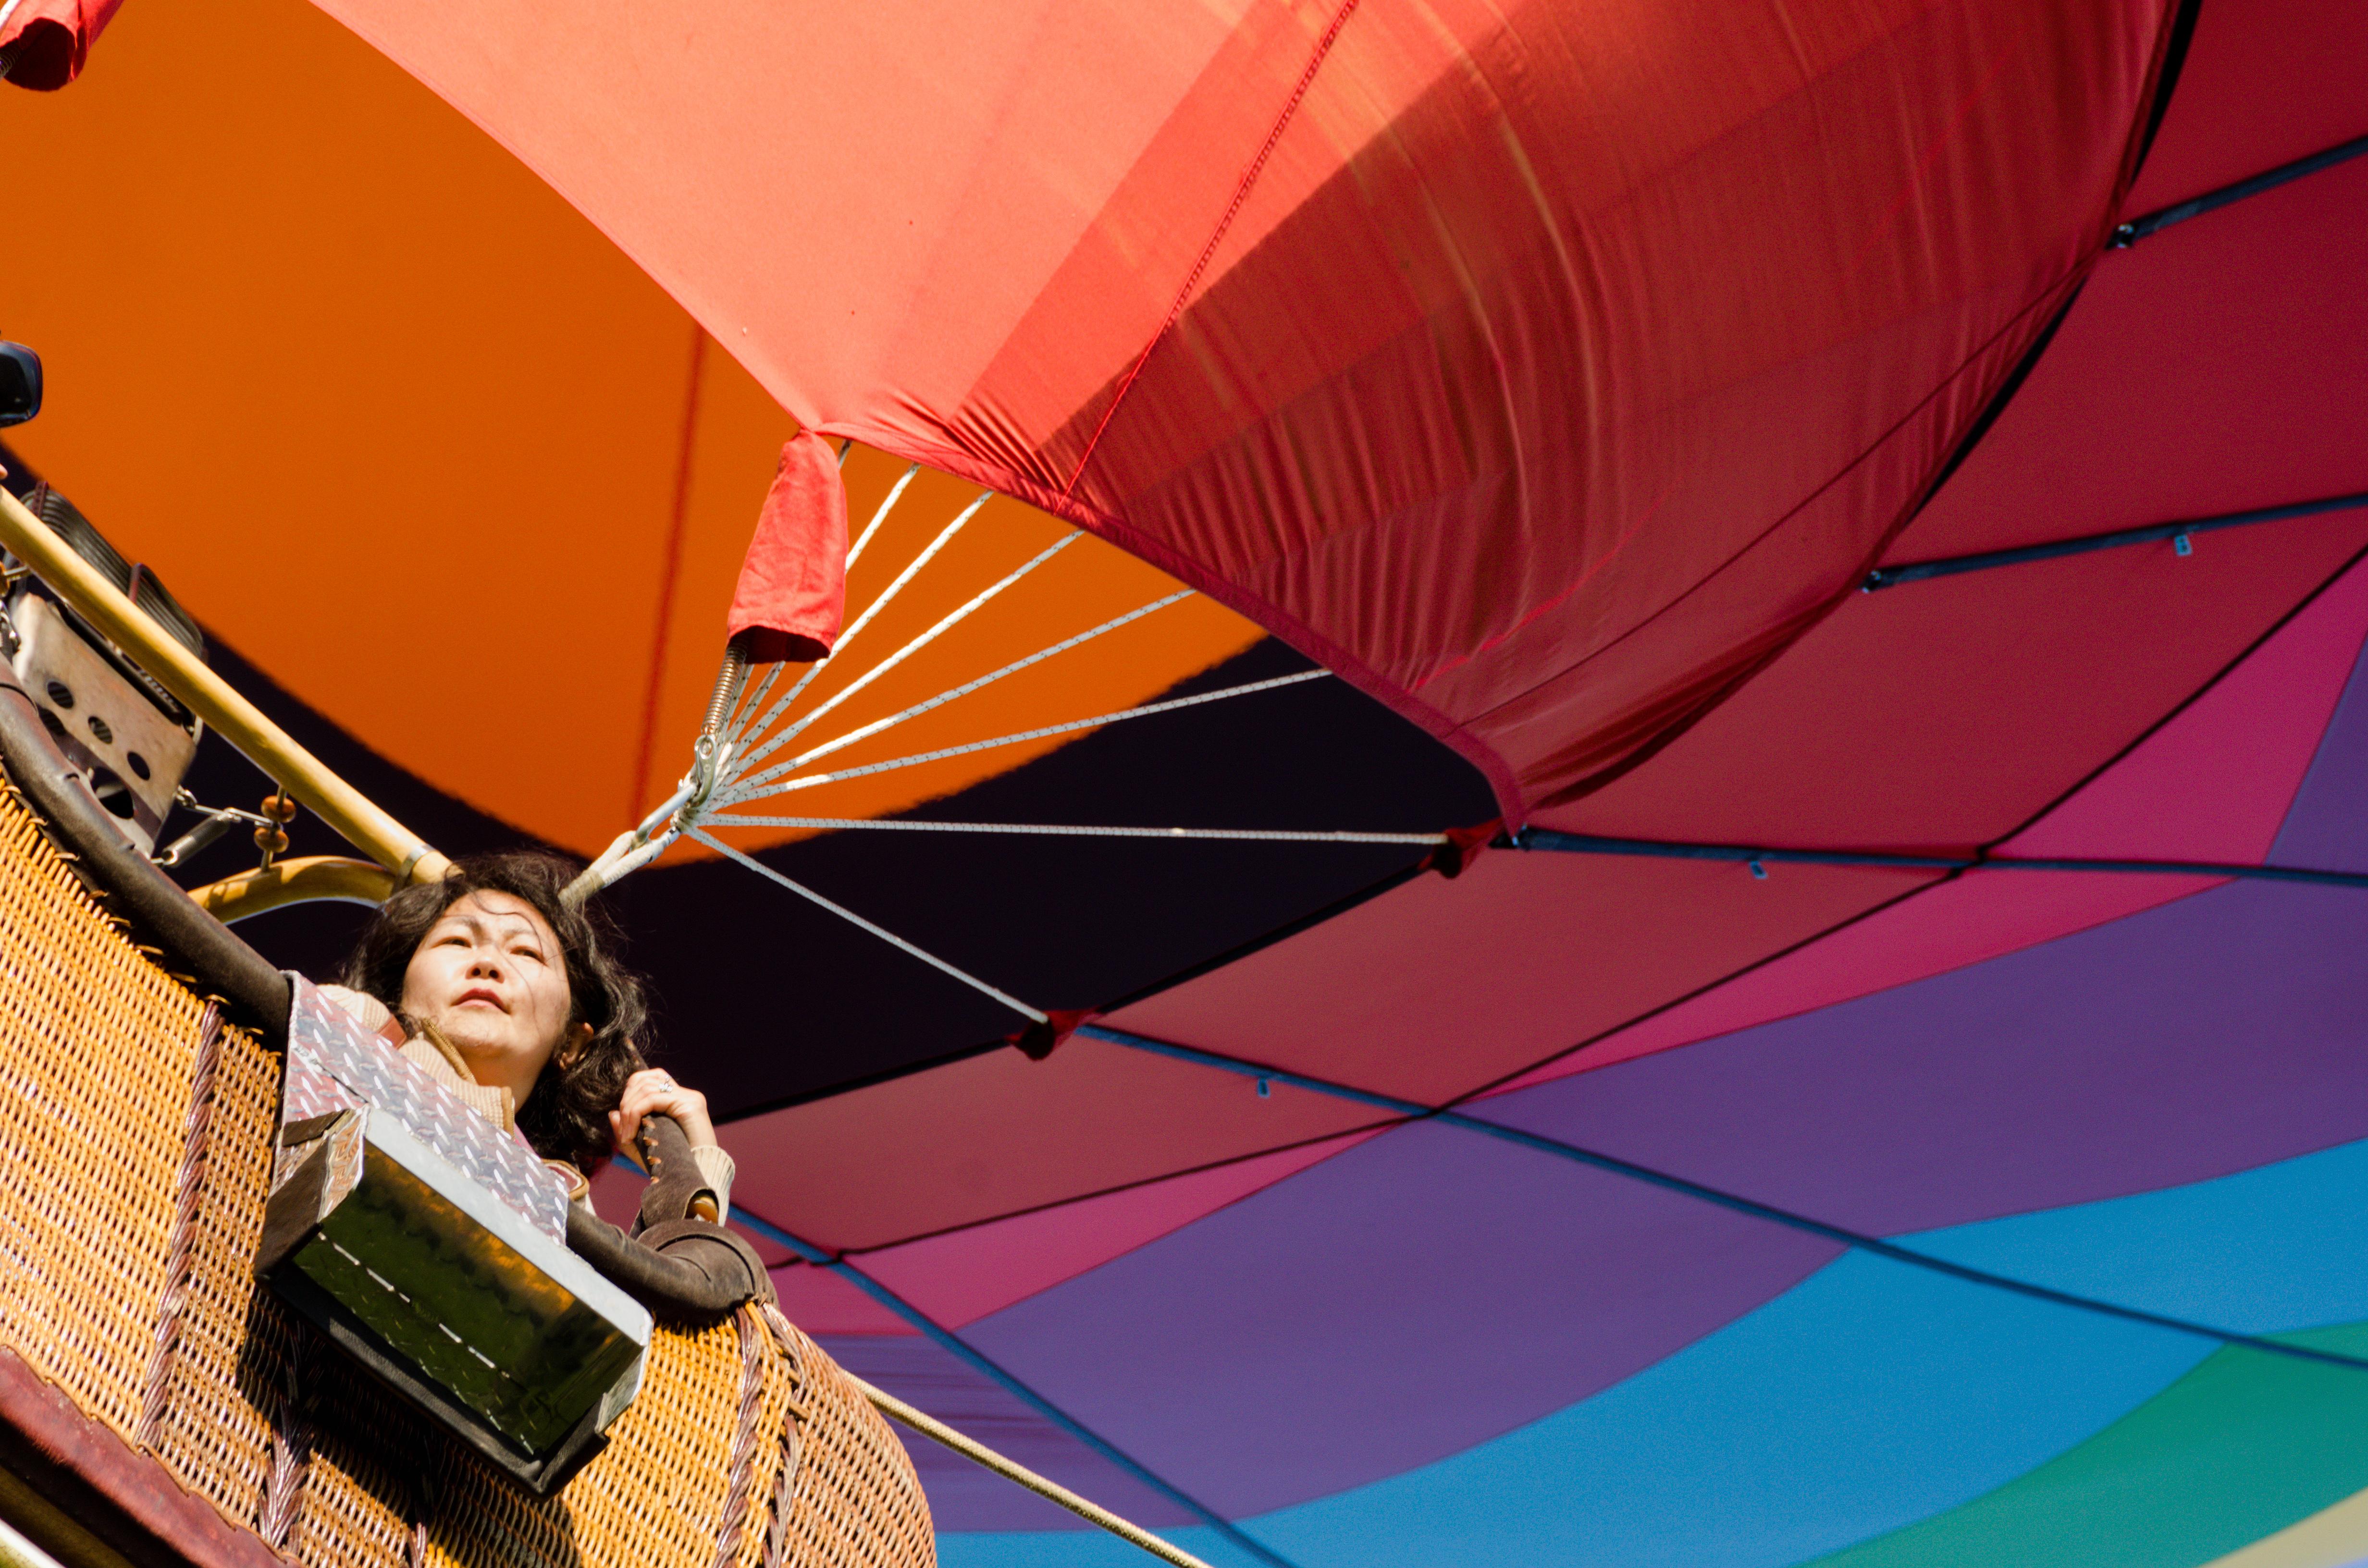 On a tethered balloon ride | Preakness Celebration Balloon Festival | VisitHowardCounty.com